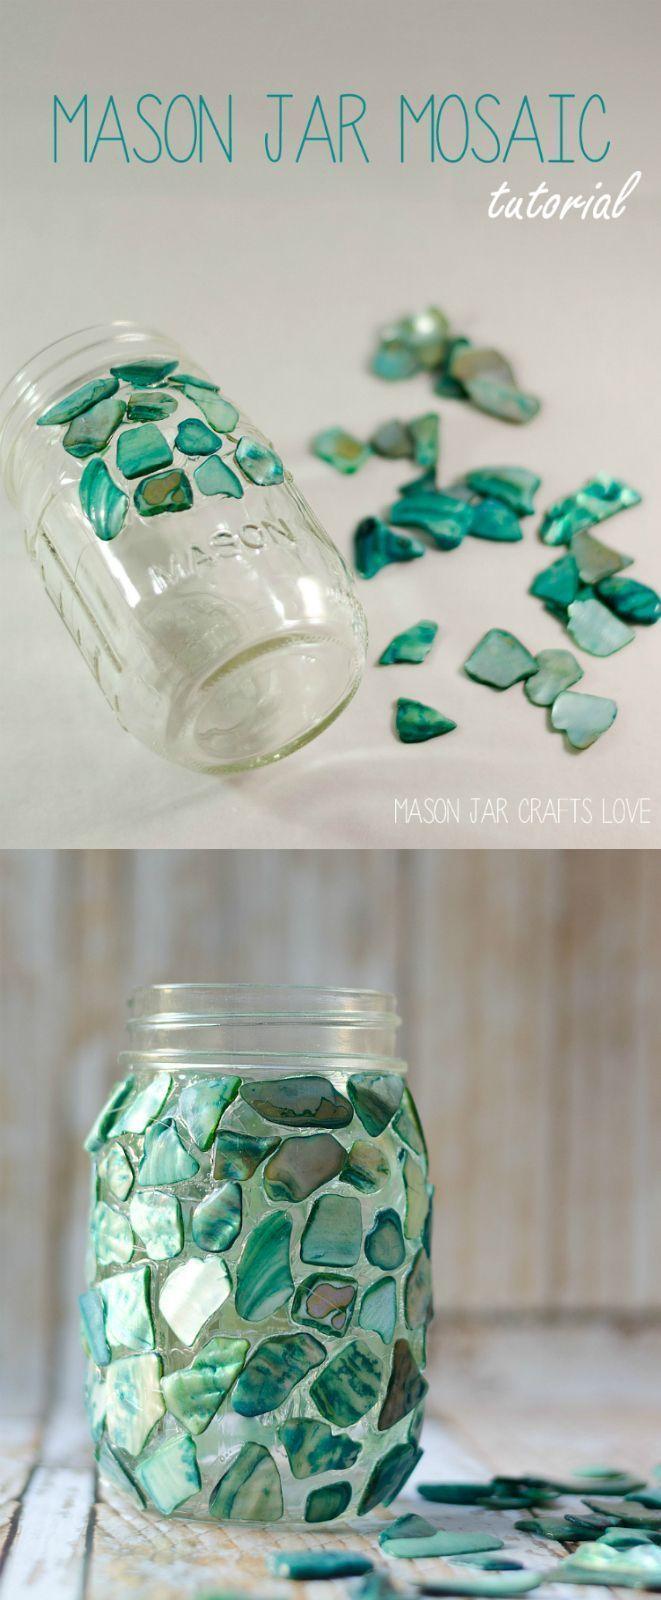 Mosaic Mason Jar Diy Inspiration For Crafts And Home Pinterest